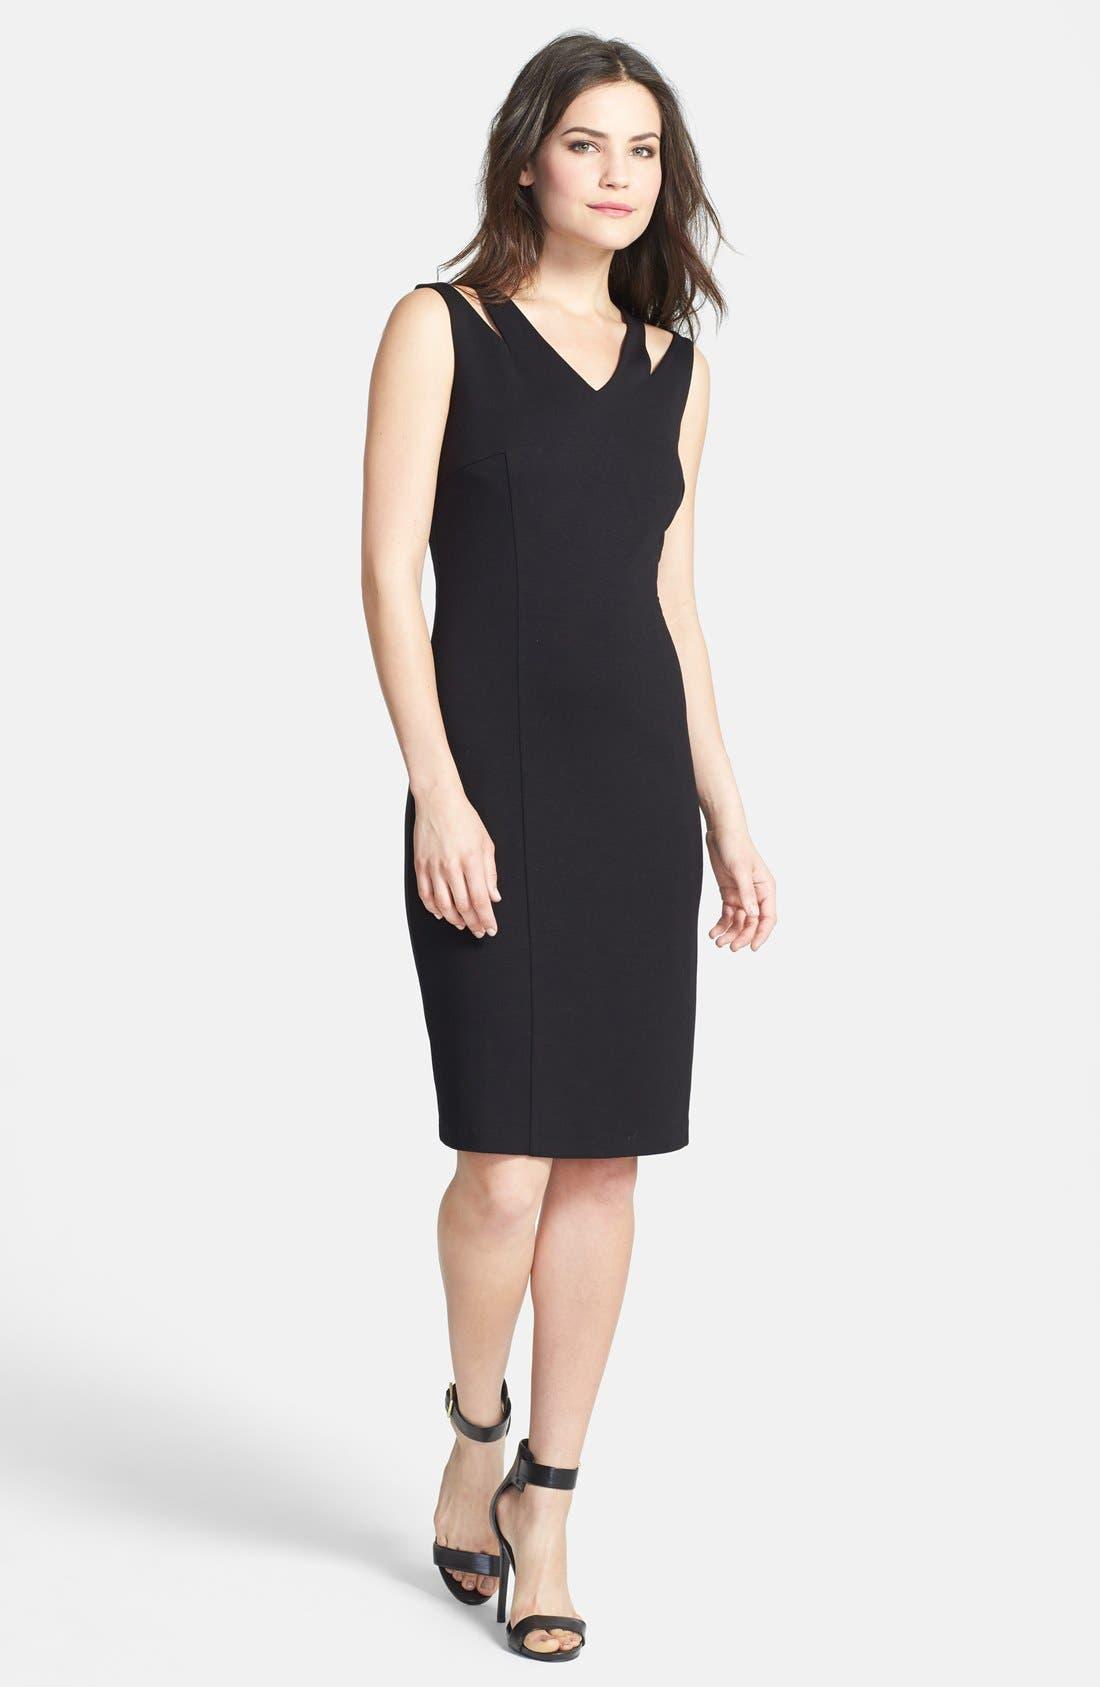 Alternate Image 1 Selected - NIC+ZOE 'Spliced' Sheath Dress